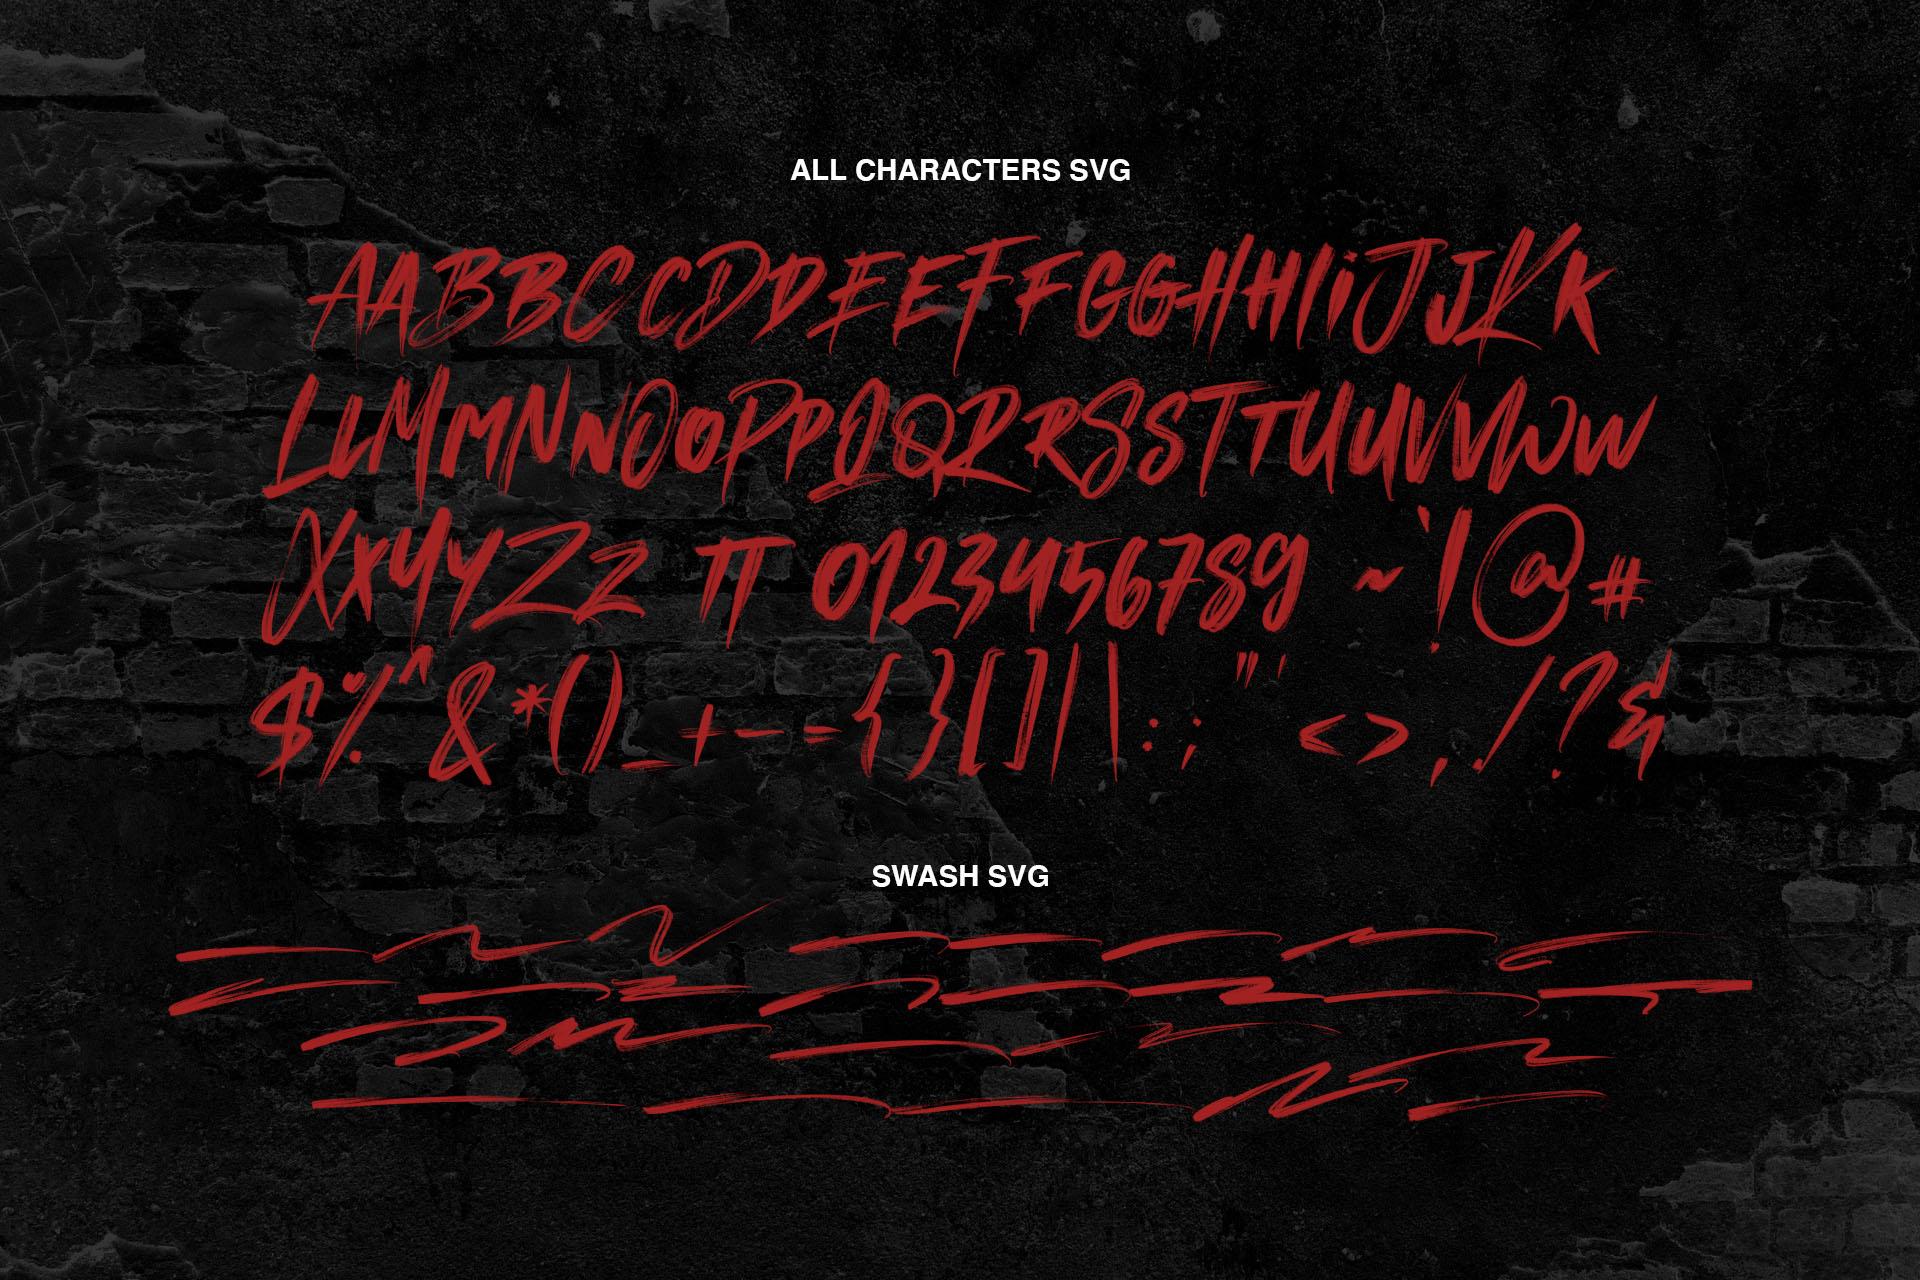 MANKIND - SVG Brush Font example image 9